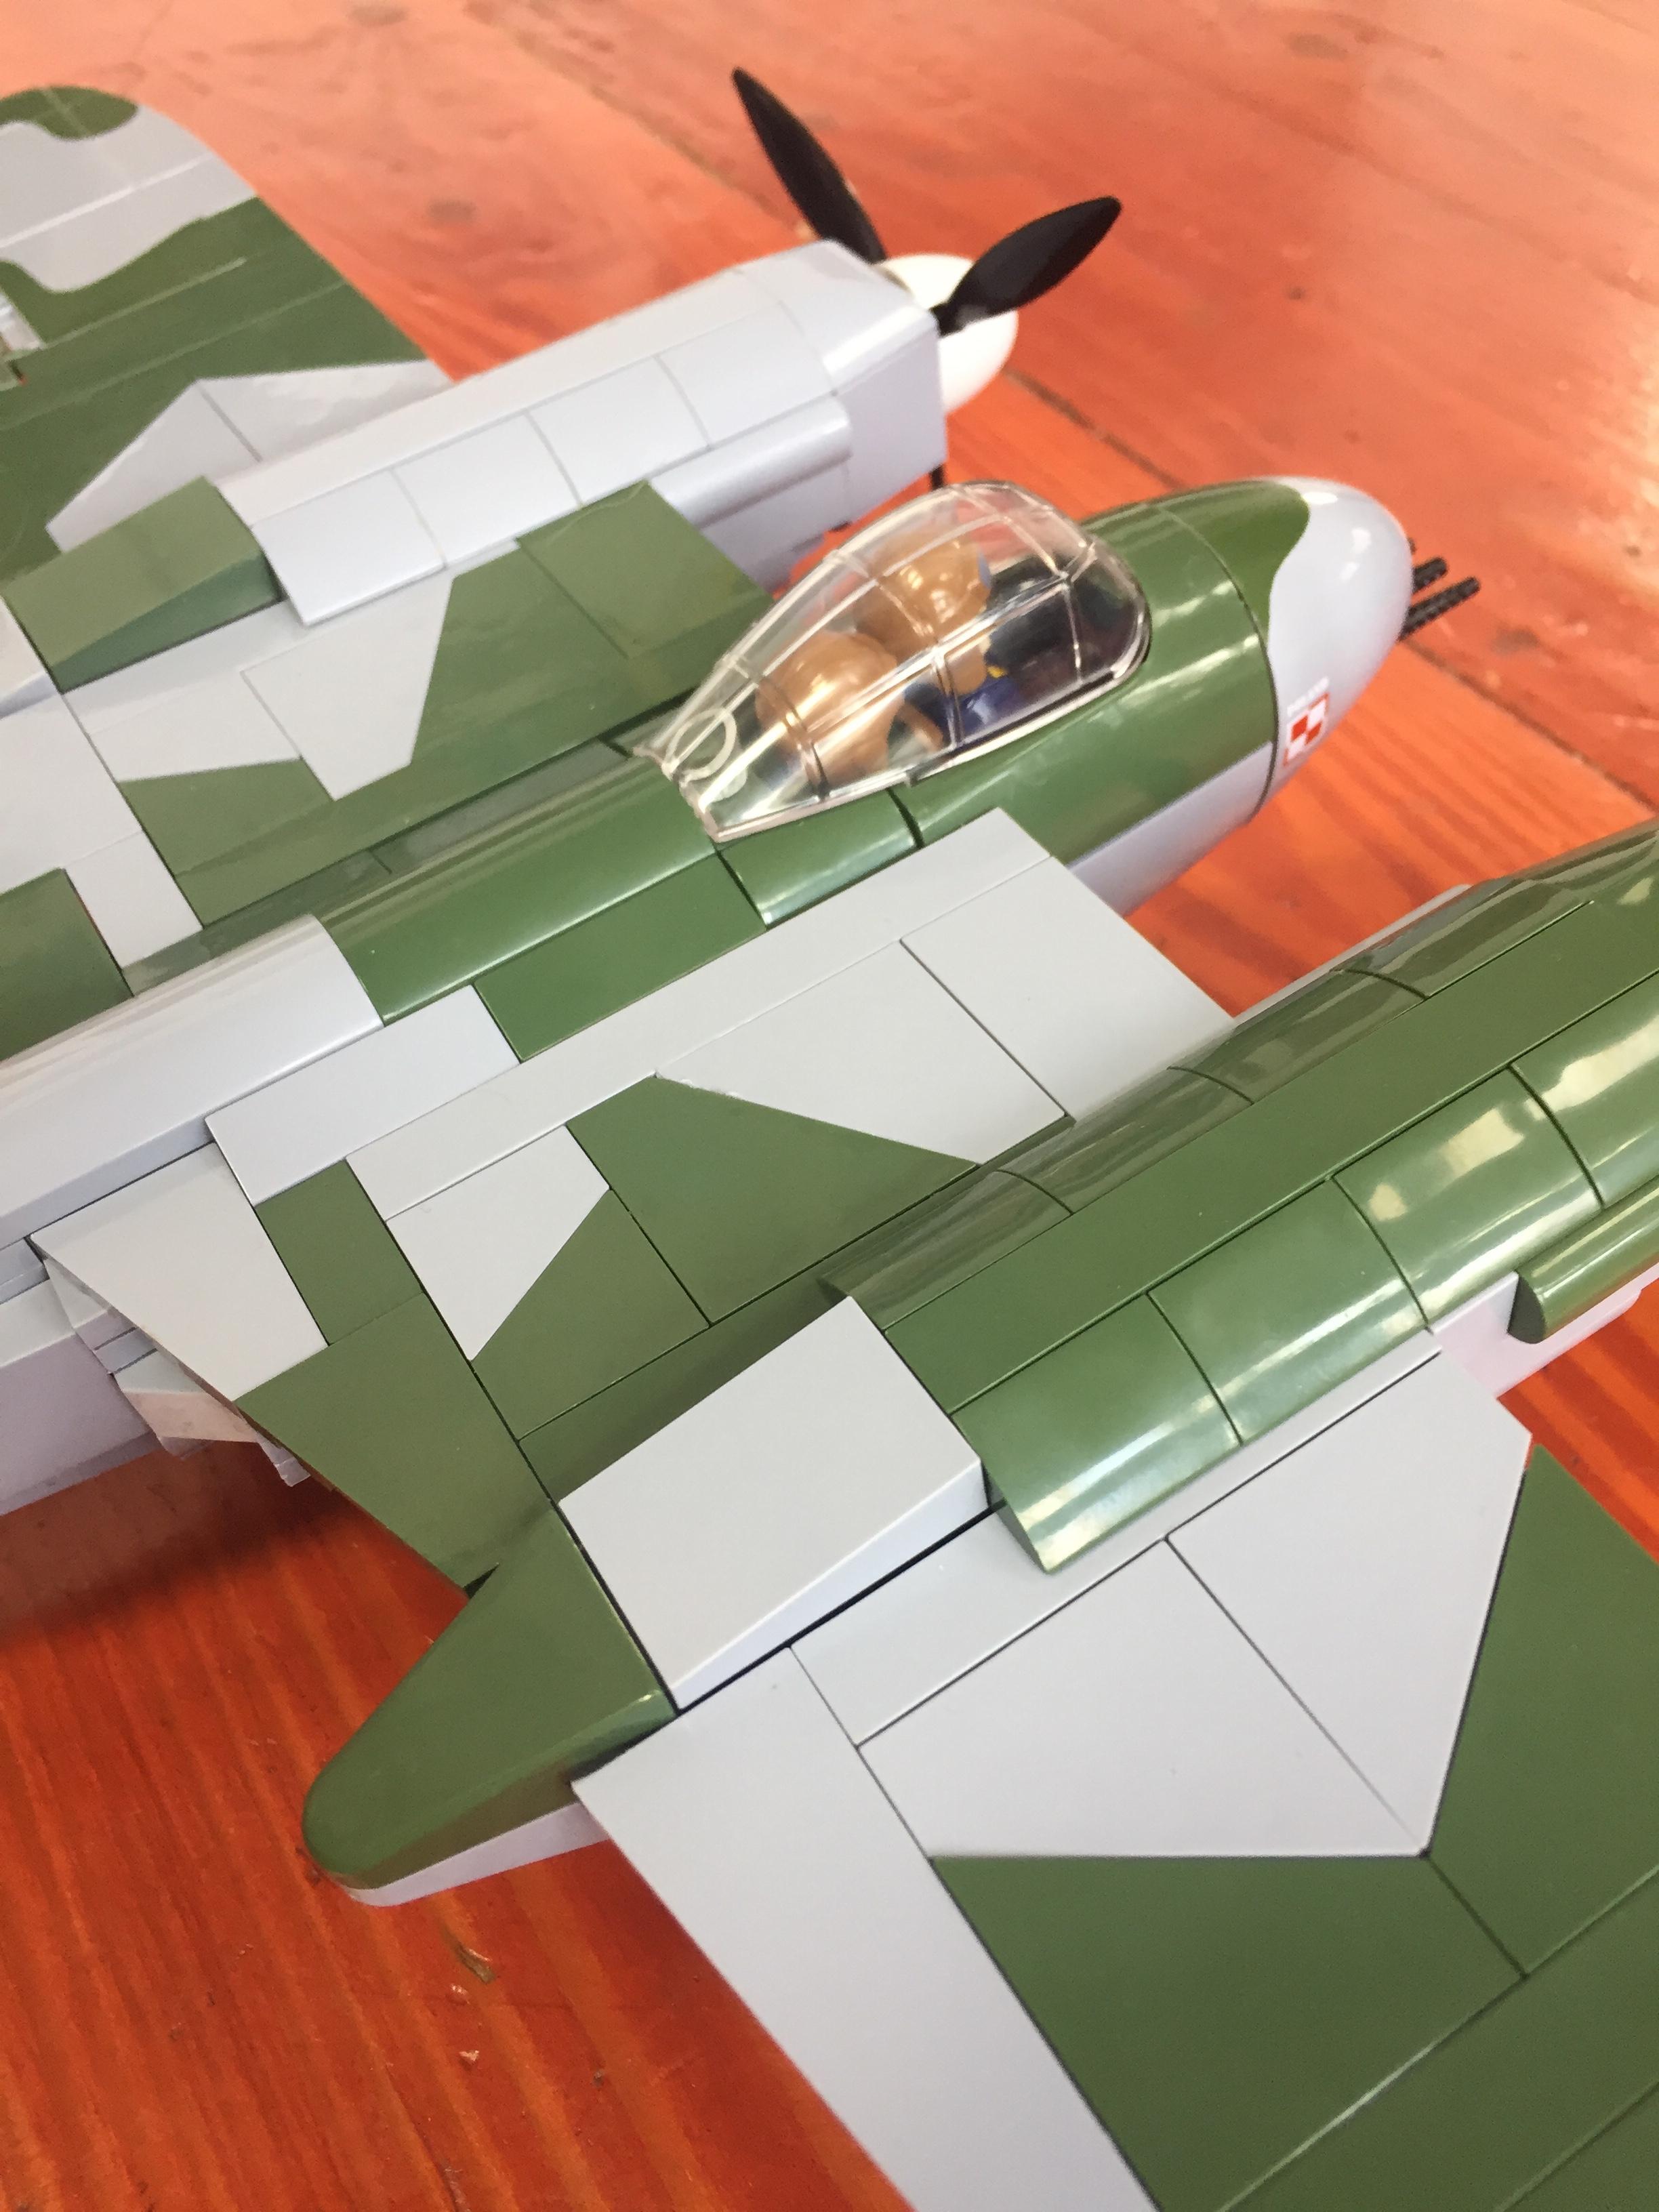 COBI Historical Collections building bricks toys De Havilland airplane model